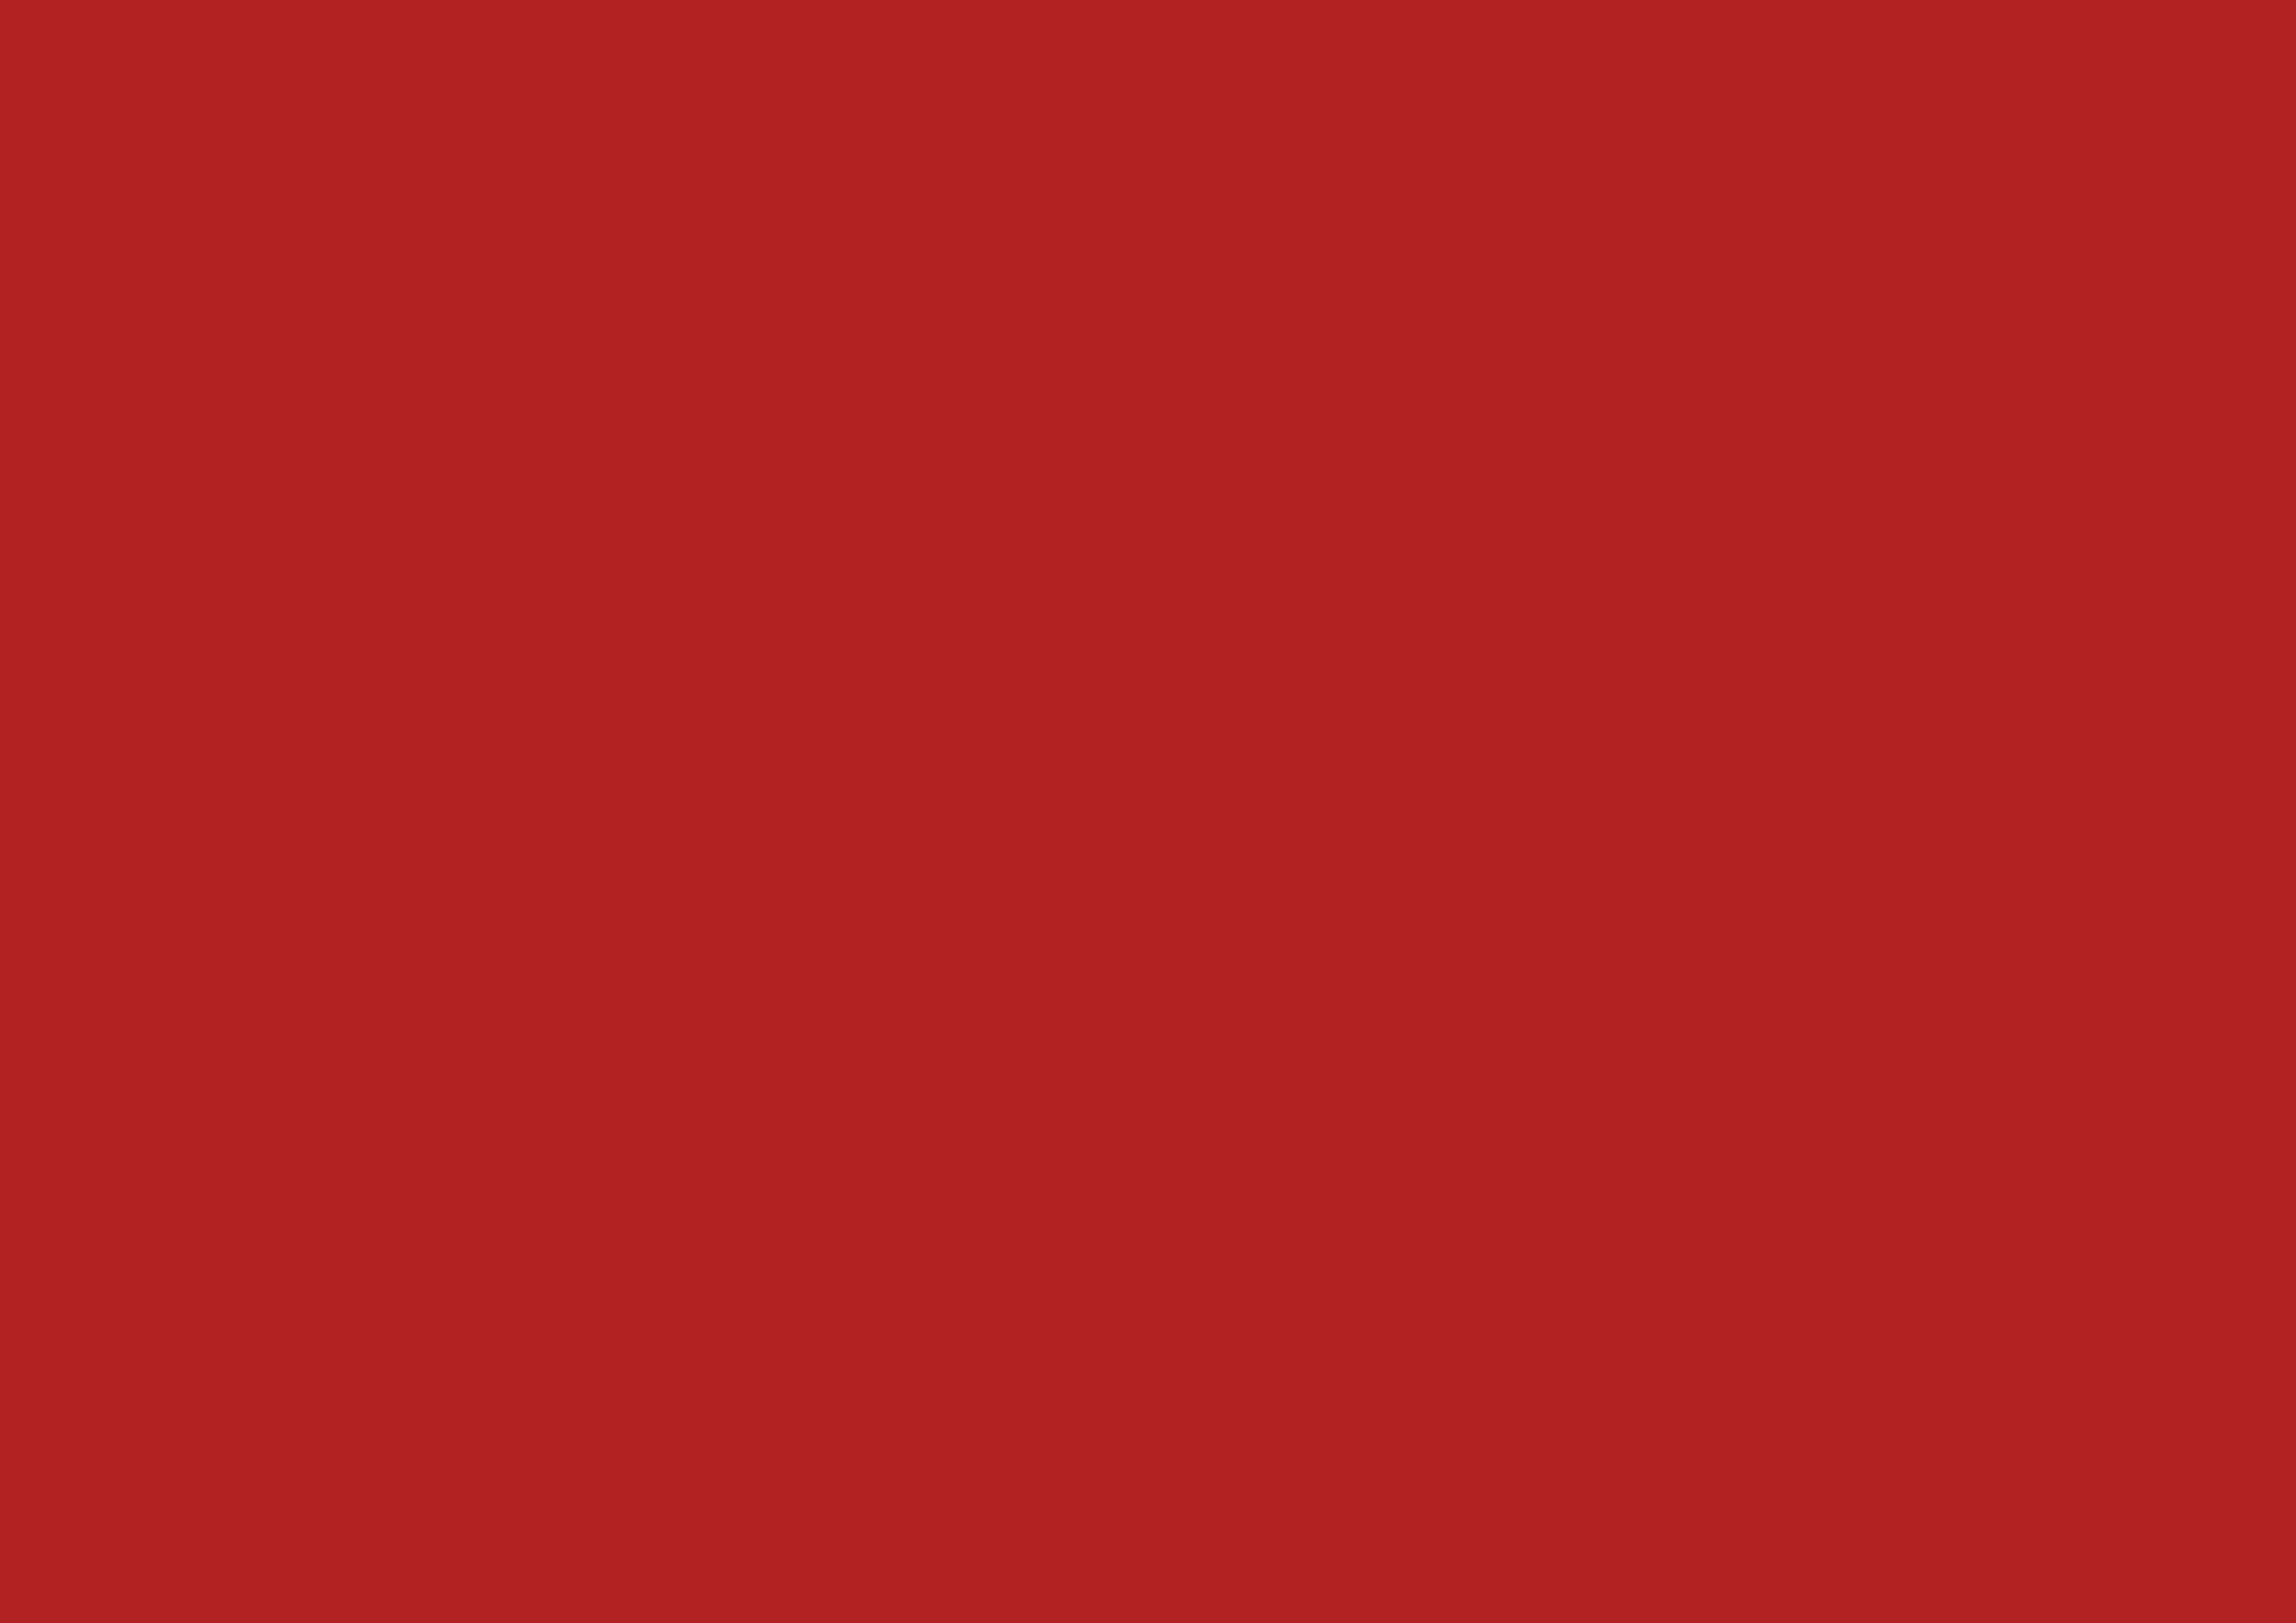 3508x2480 Firebrick Solid Color Background